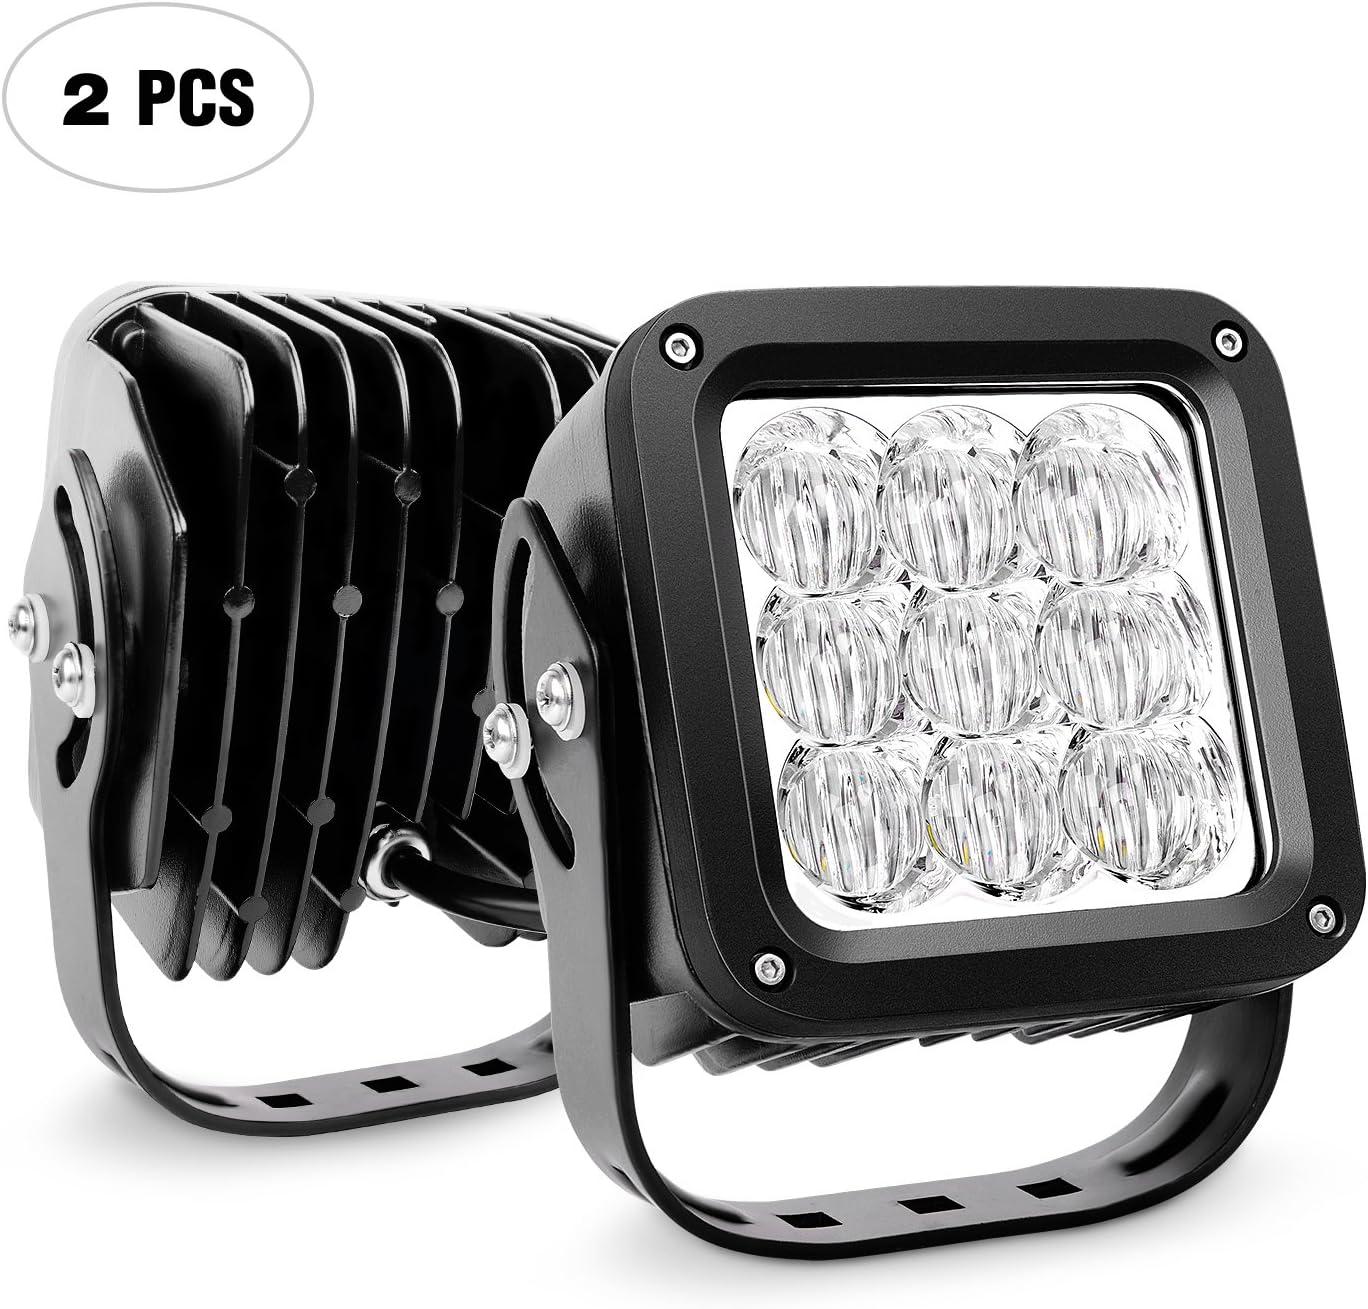 Pickup Off-Road Luz antiniebla para Tractores,Camiones Todo Terreno ATV Barco Nilight Focos LED,2pcs 18W 1260Lm Spot /& Flood Combo Bar LED Faros de Trabajo LED 12V-24V SUV